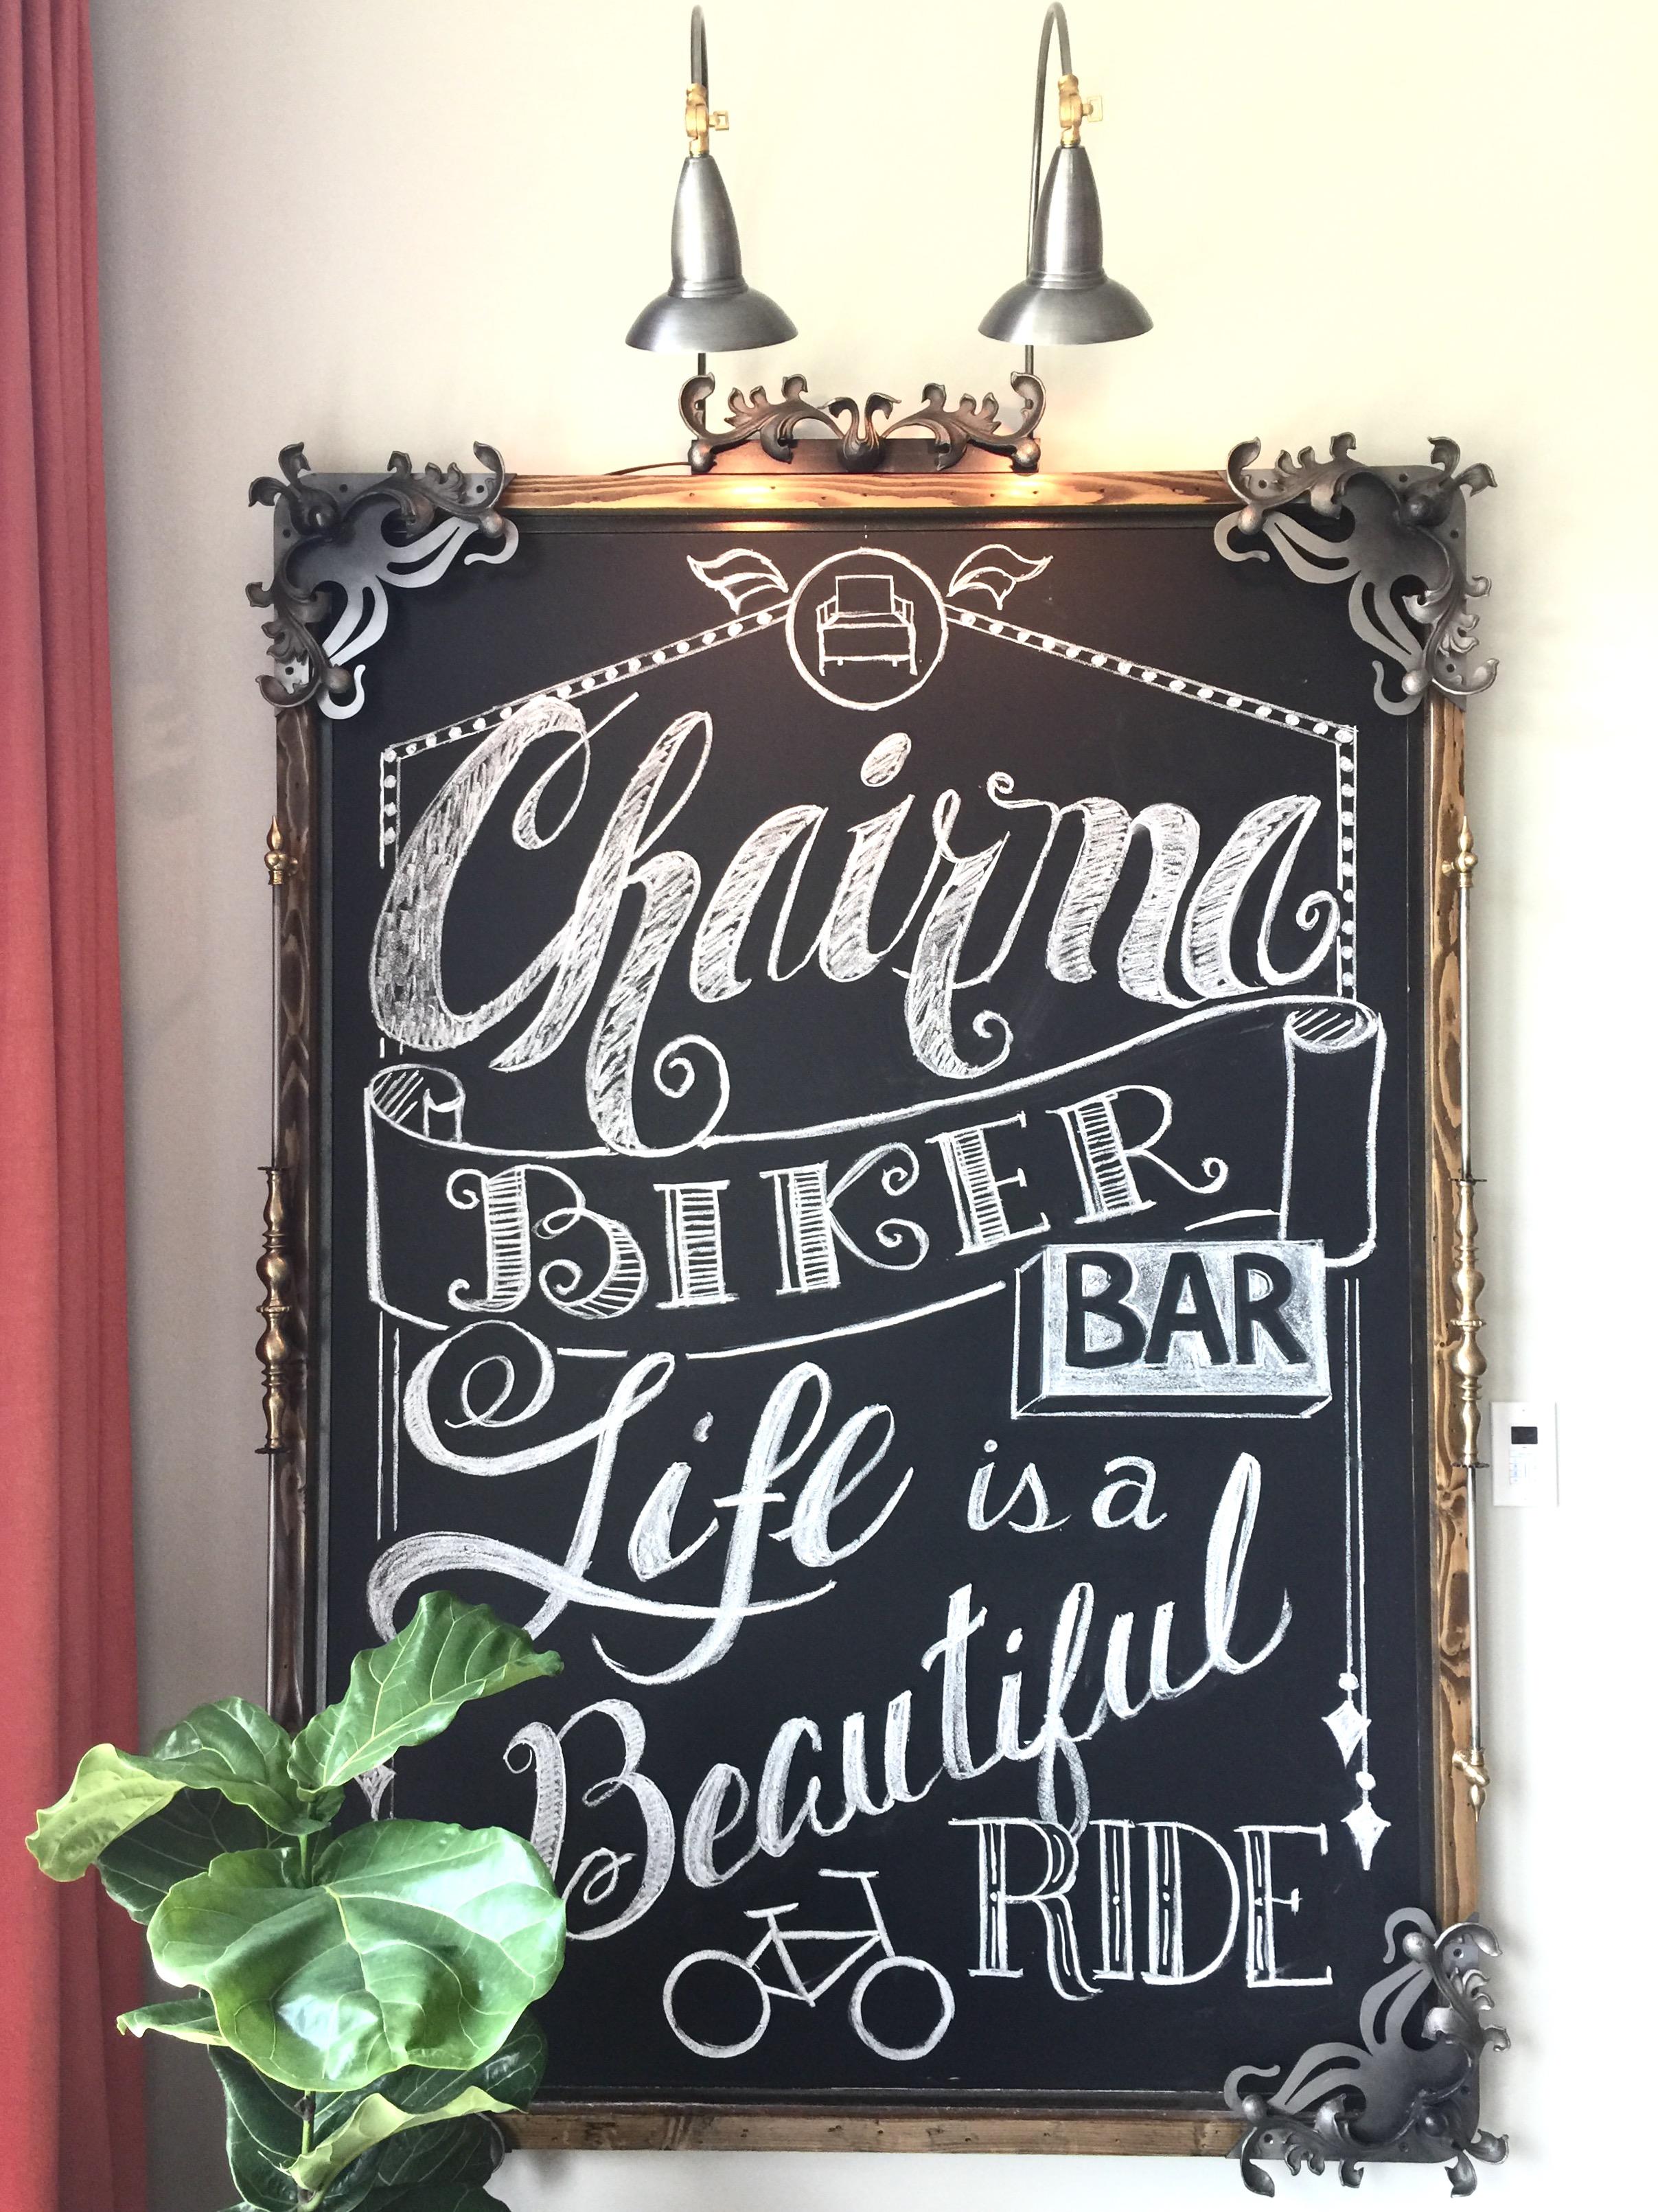 Custom Chalkboard - Designed by Chairma Design Group, Chalk Artist - Sarita Ackerman